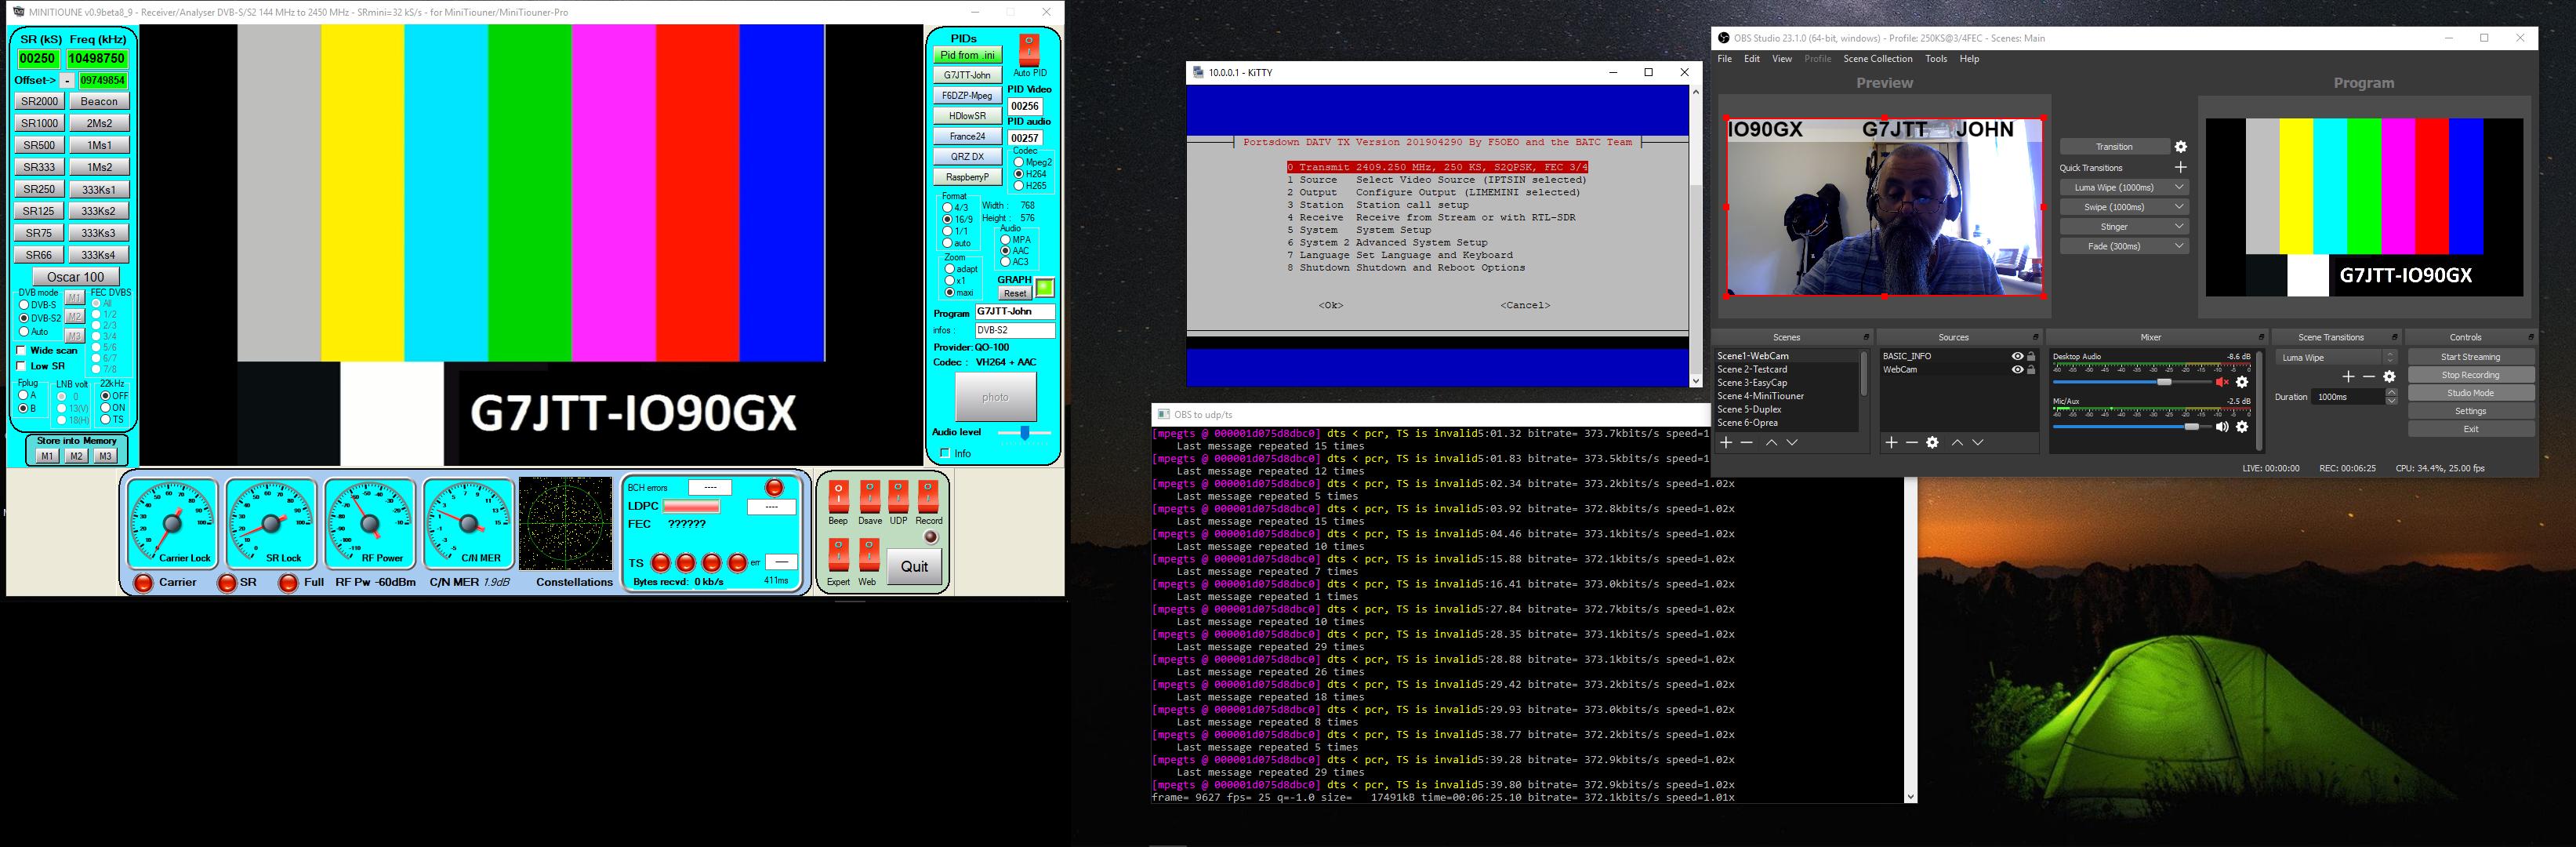 Screenshot 2019-05-22 07.33.05.png